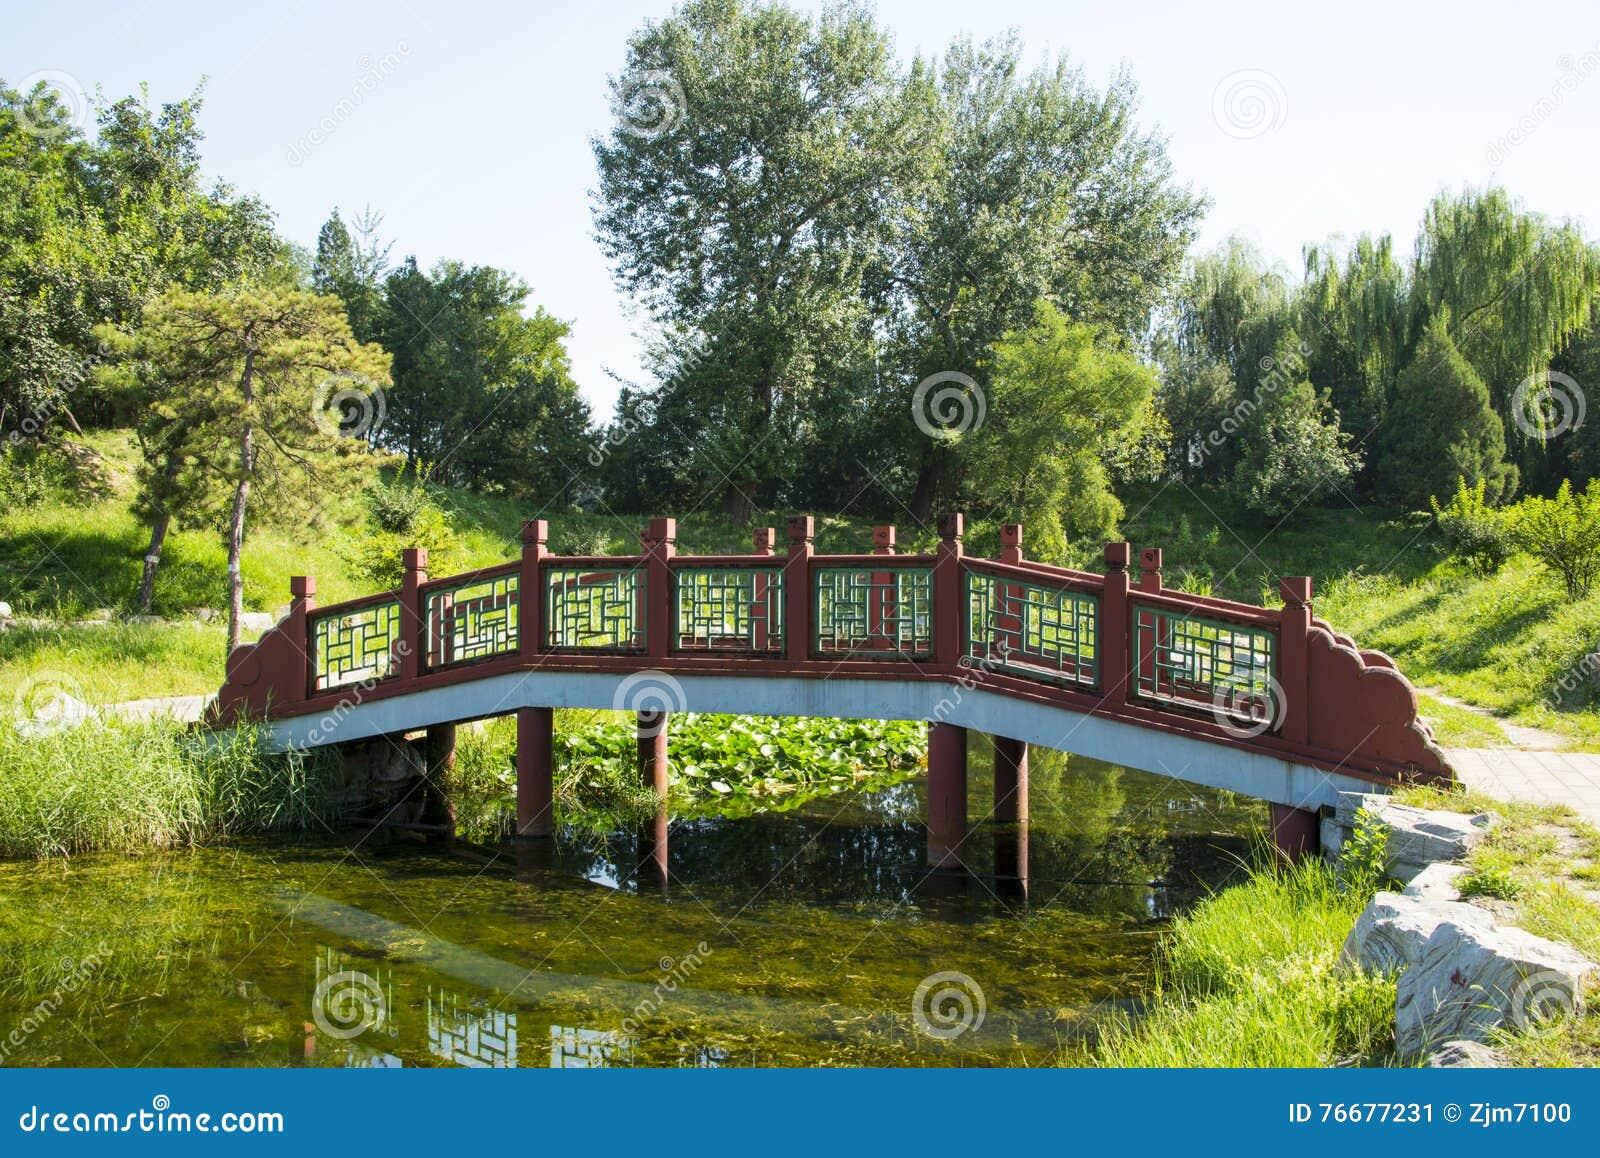  Capitulo  MADEIRAAAAAAAAAA %C3%A1sia-china-pequim-pal%C3%A1cio-de-ver%C3%A3o-velho-paisagem-do-jardim-ponte-de-madeira-76677231